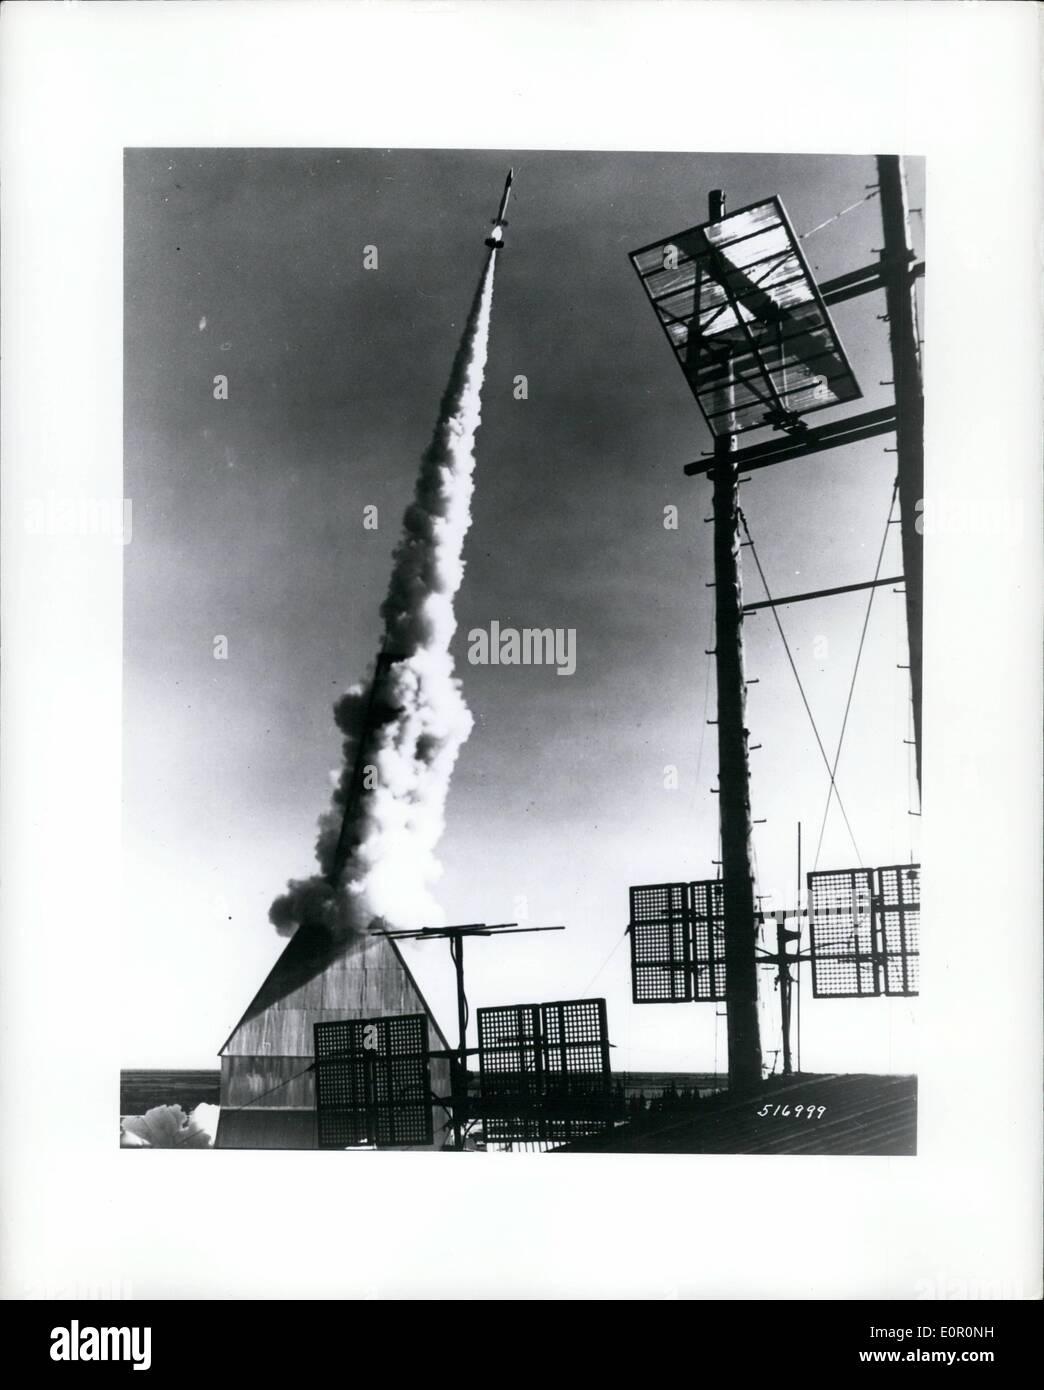 aug 08 1957 canada delayed action fireworks aerobee rocket